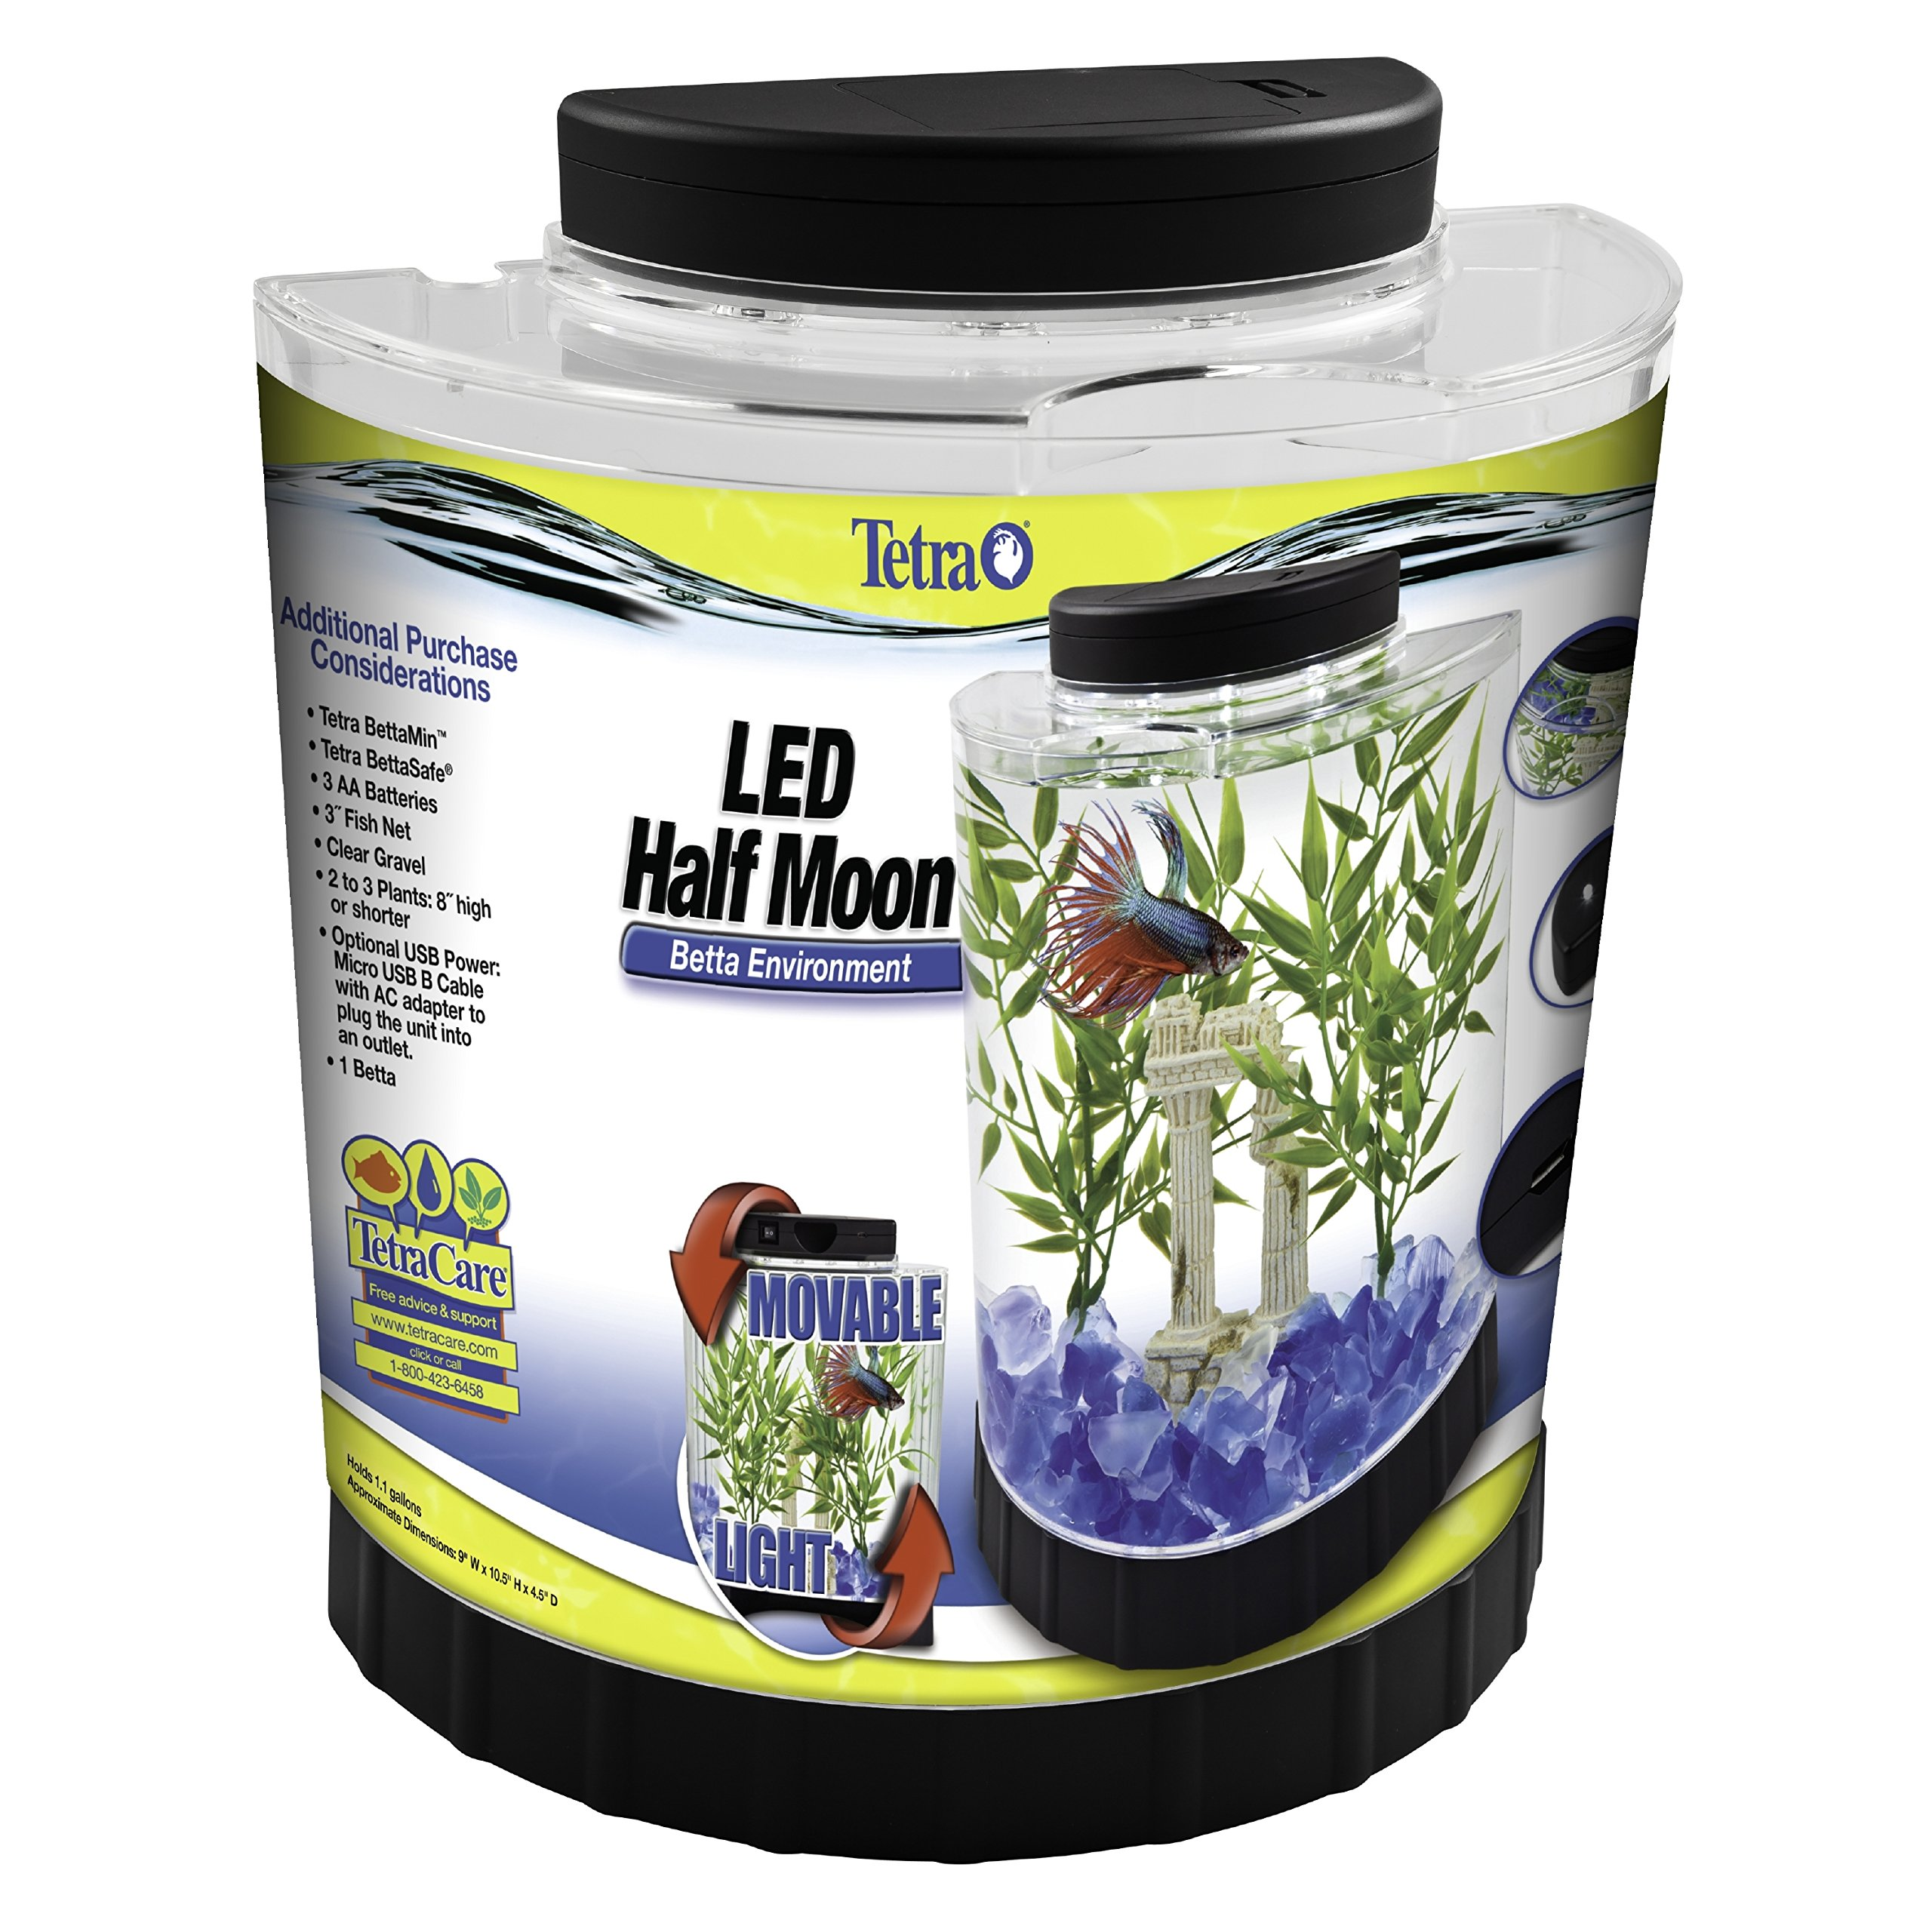 Betta Fish Aquarium Tank Half Moon Bowl Filter Small Gold Tetra Led Light 1 1gl Pet Supplies Fish Aquariums